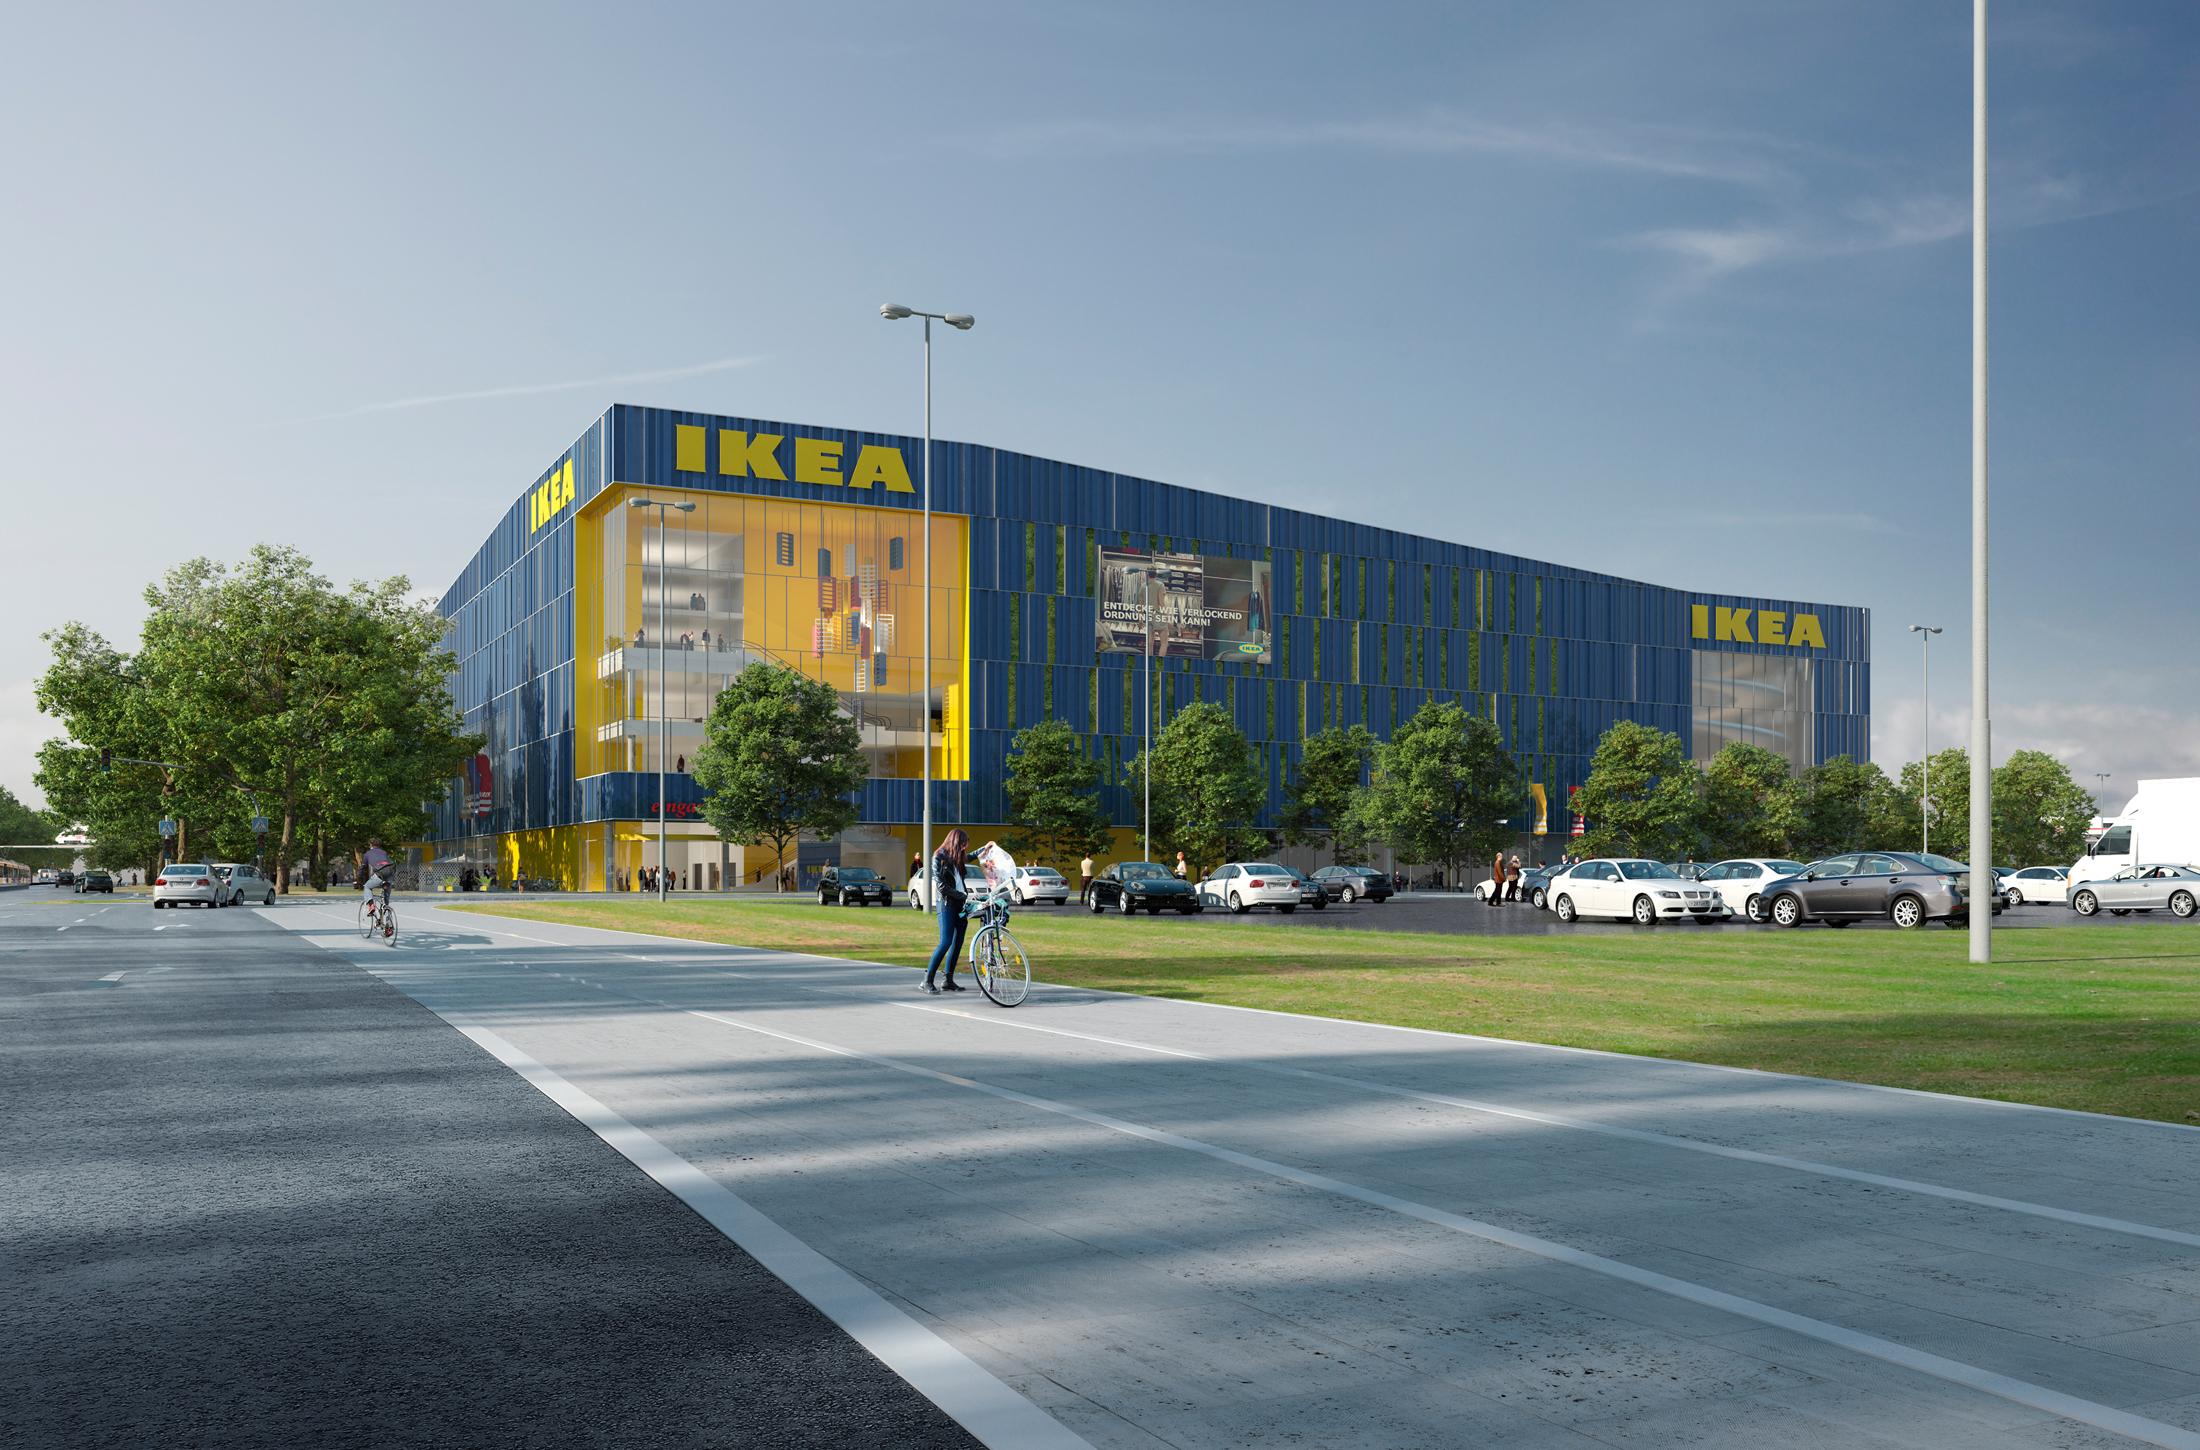 Ikea Karlsruhe DFZ ARCHITEKTEN